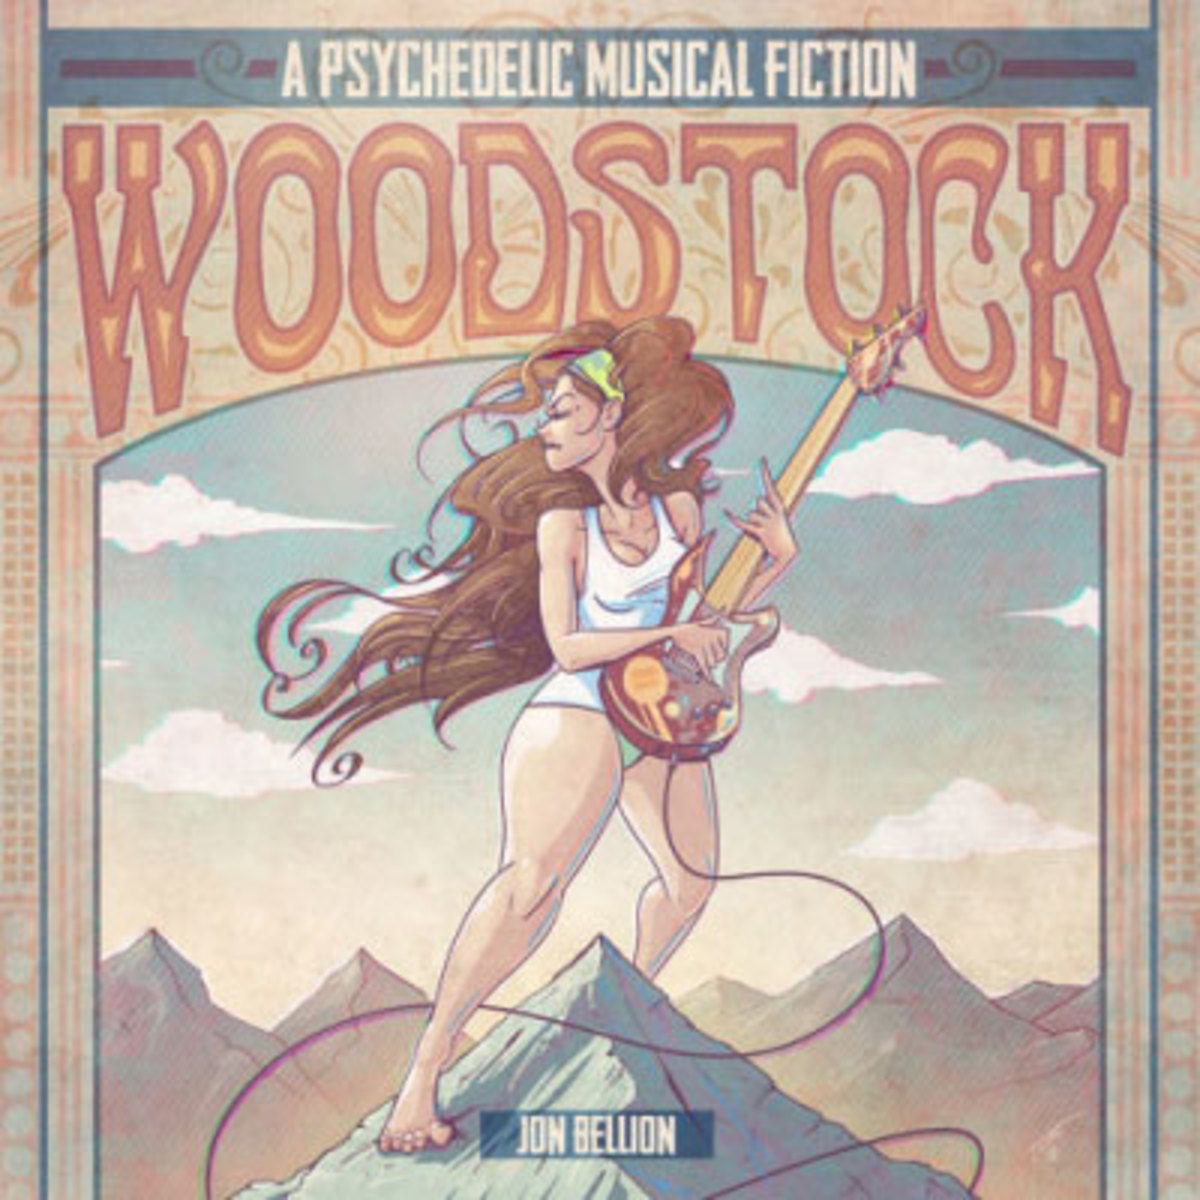 jon-bellion-woodstock.jpg